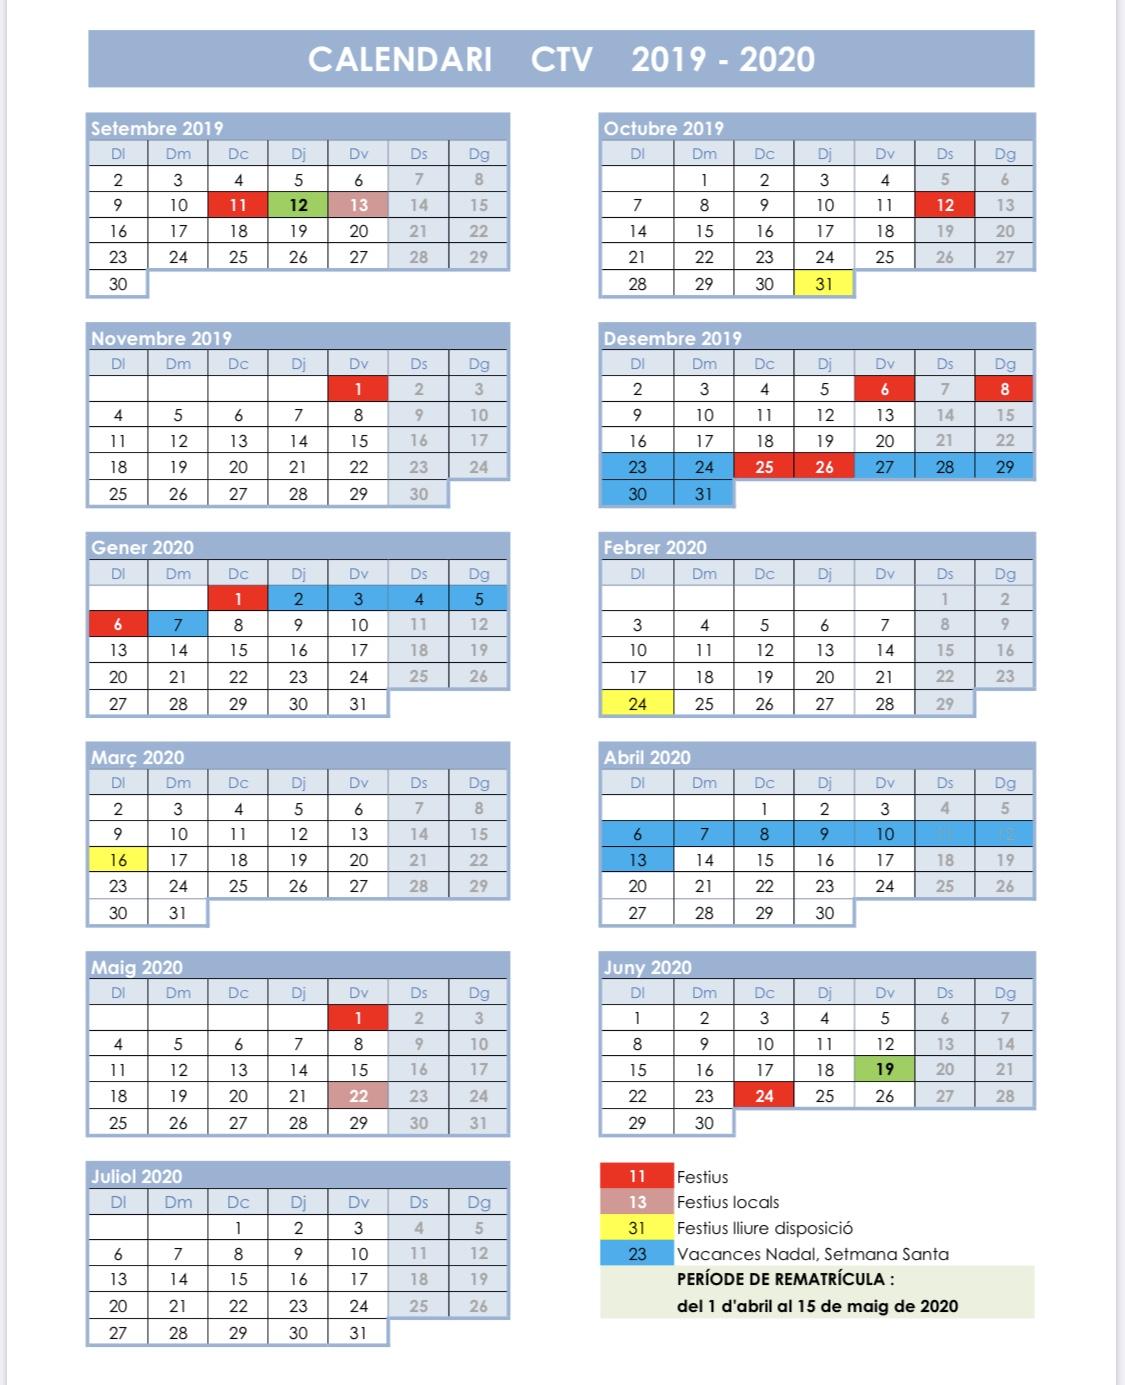 Calendari CTV 2020